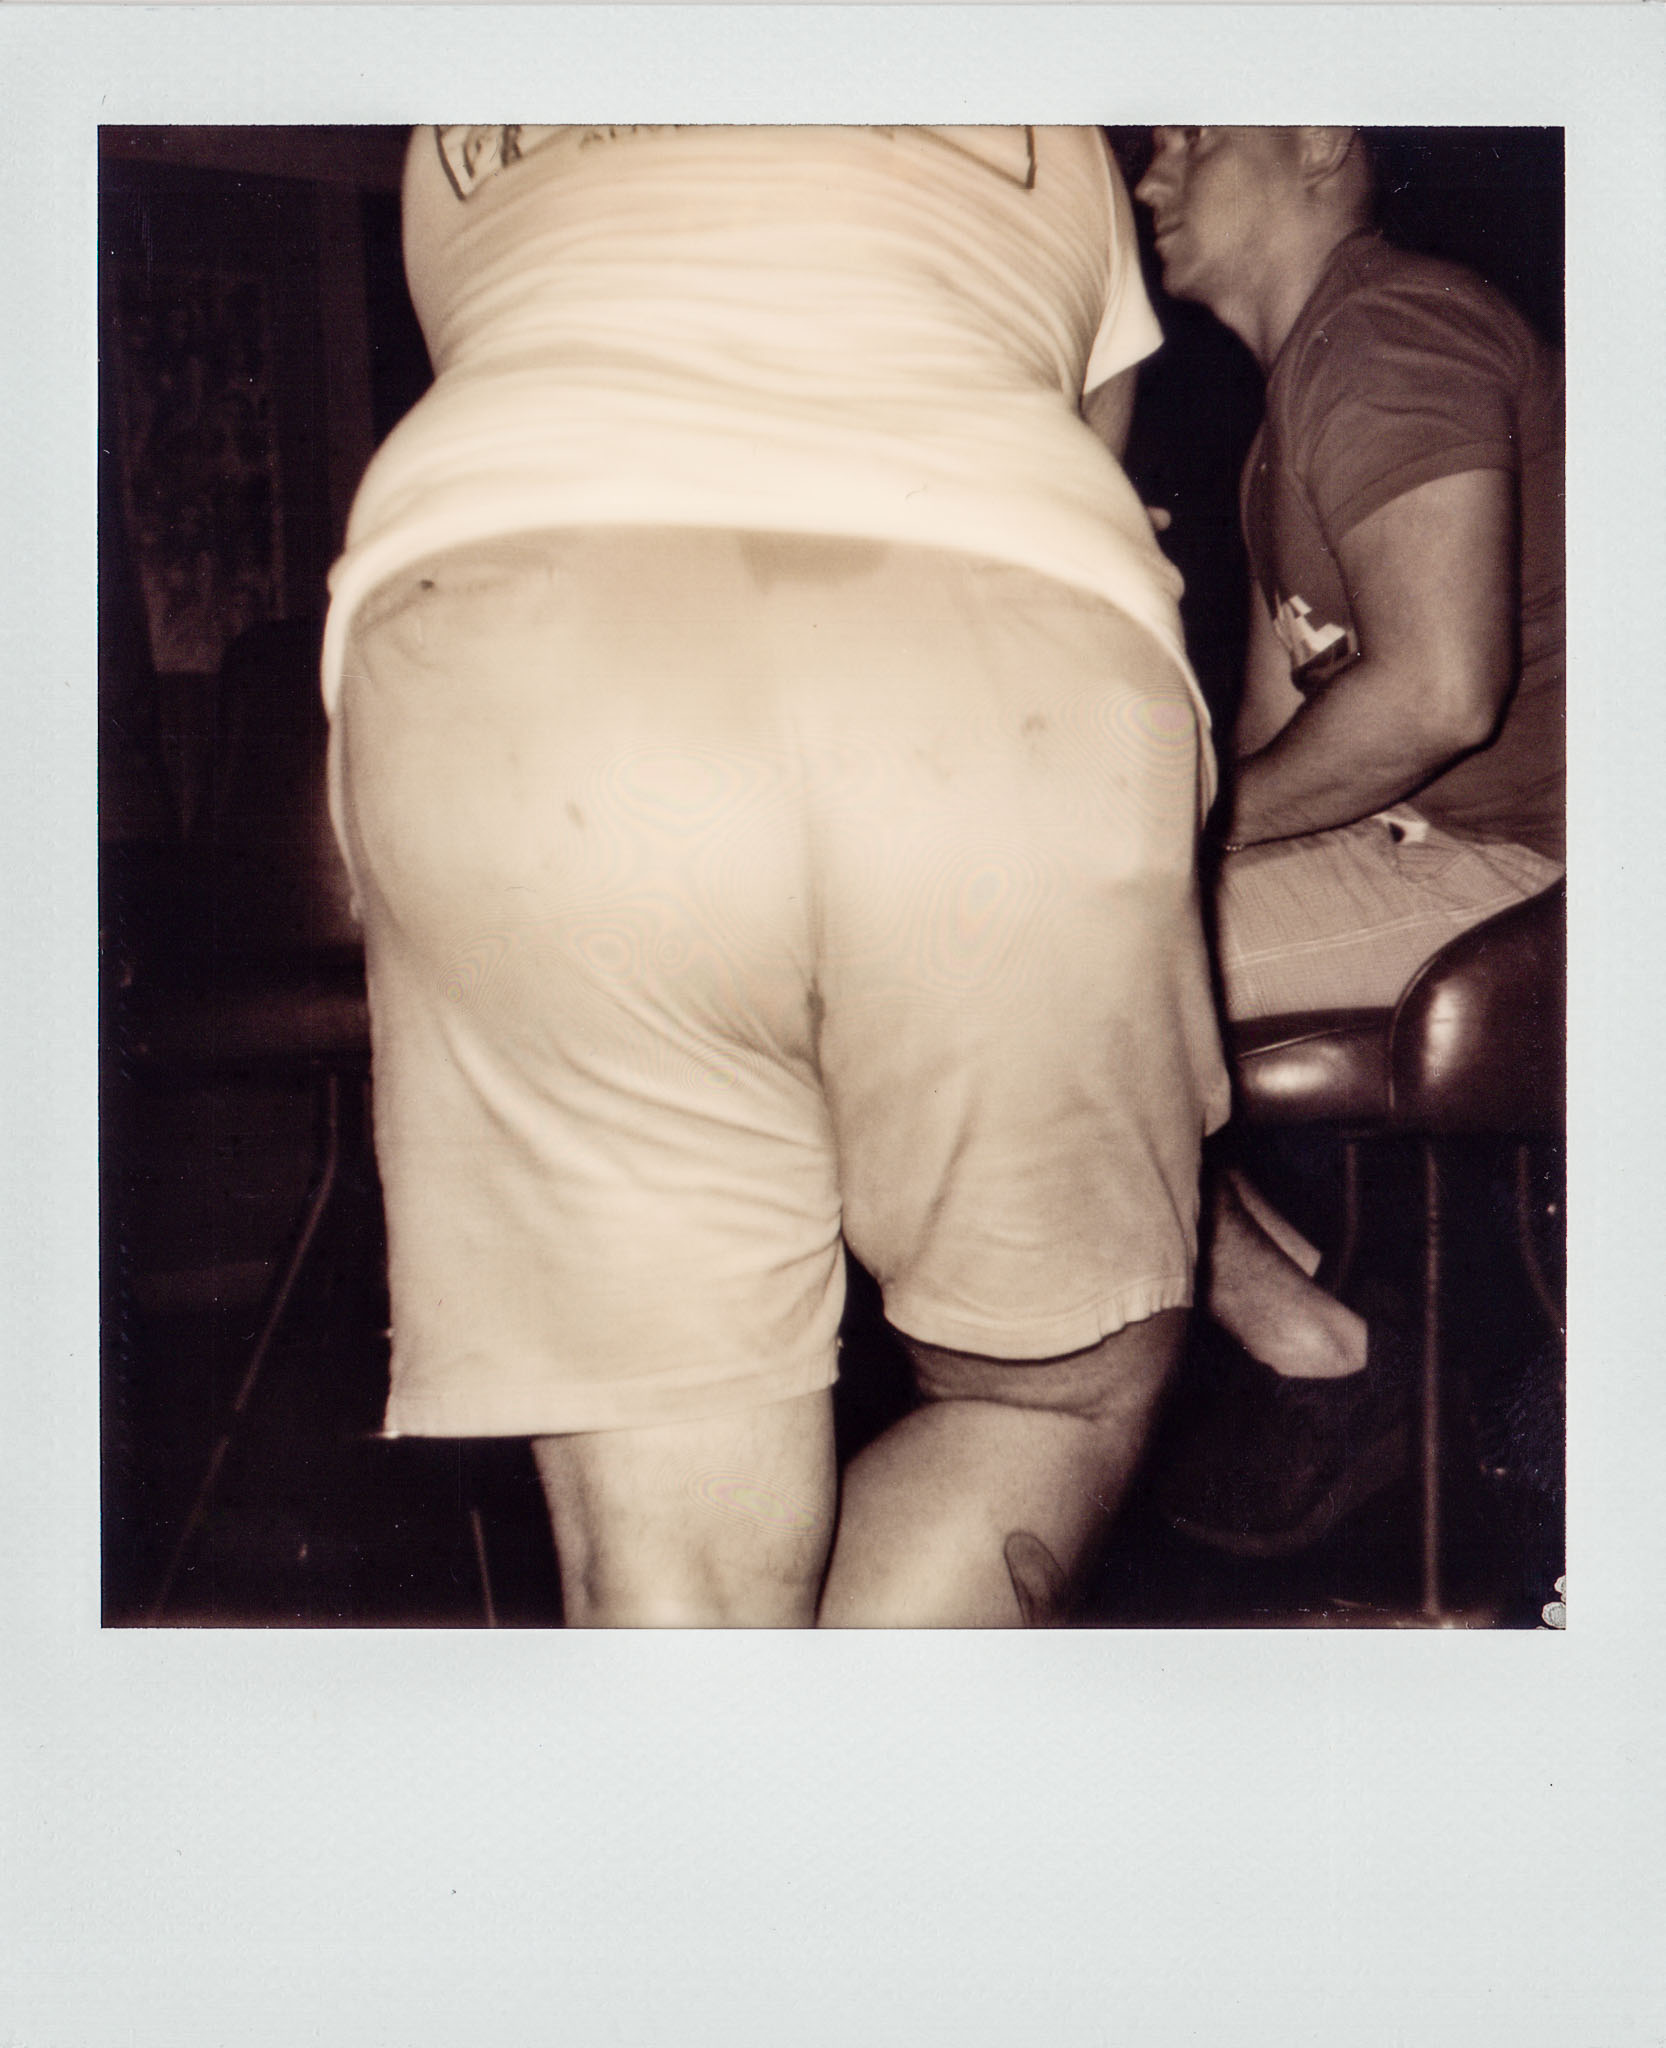 Jordan Eichenblatt's butt at Wallys Mills Avenue Liquors opening party